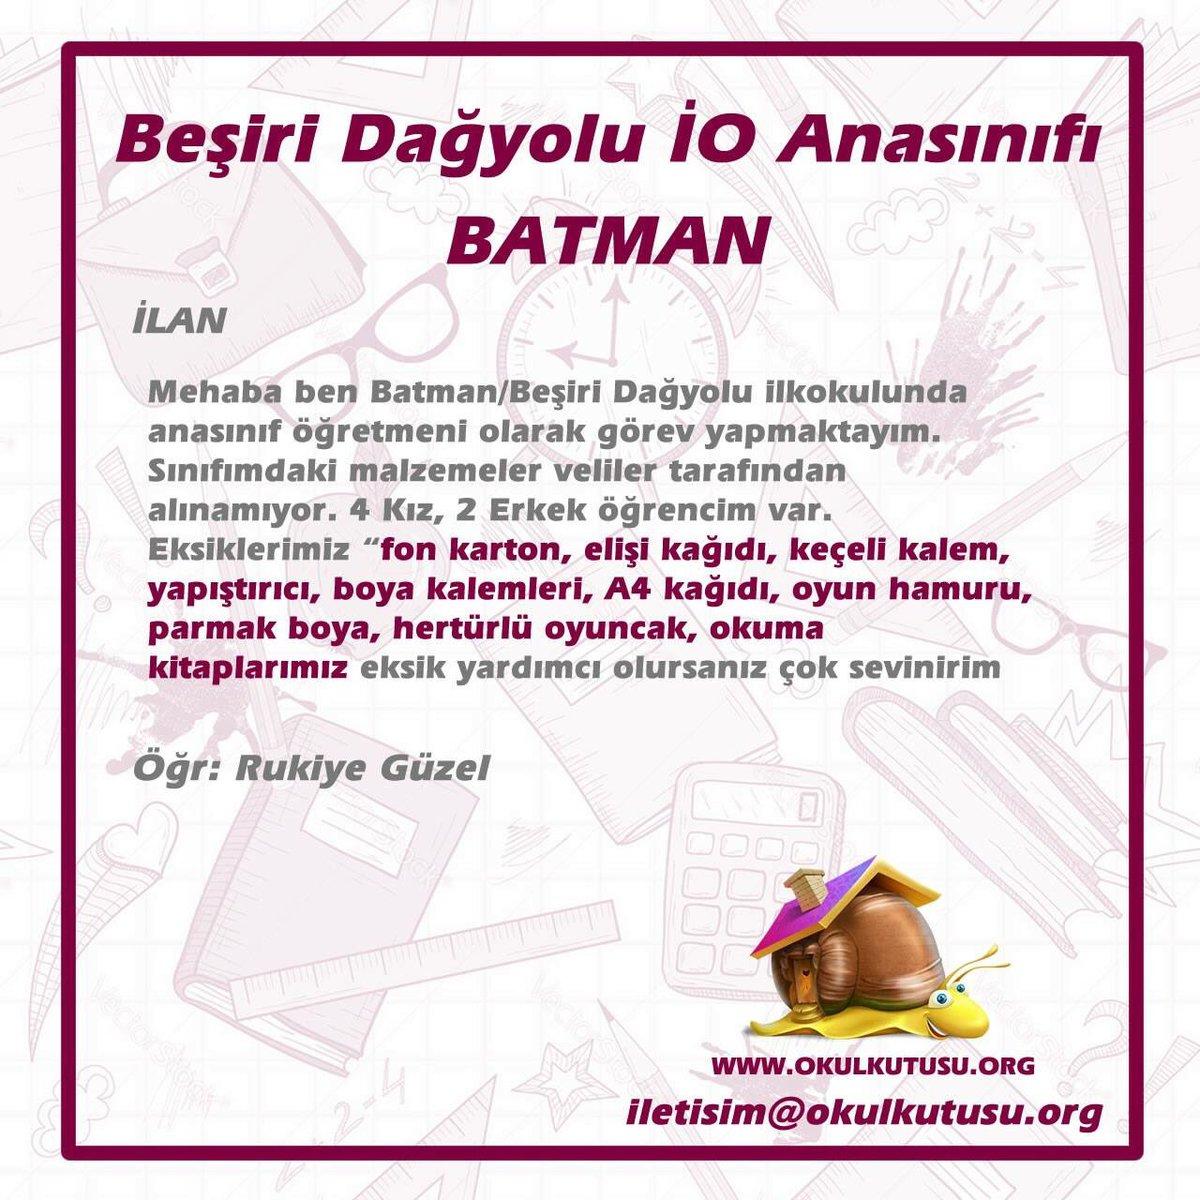 Okul Kutusu On Twitter Batman Besiri Dagyoluilkokulu